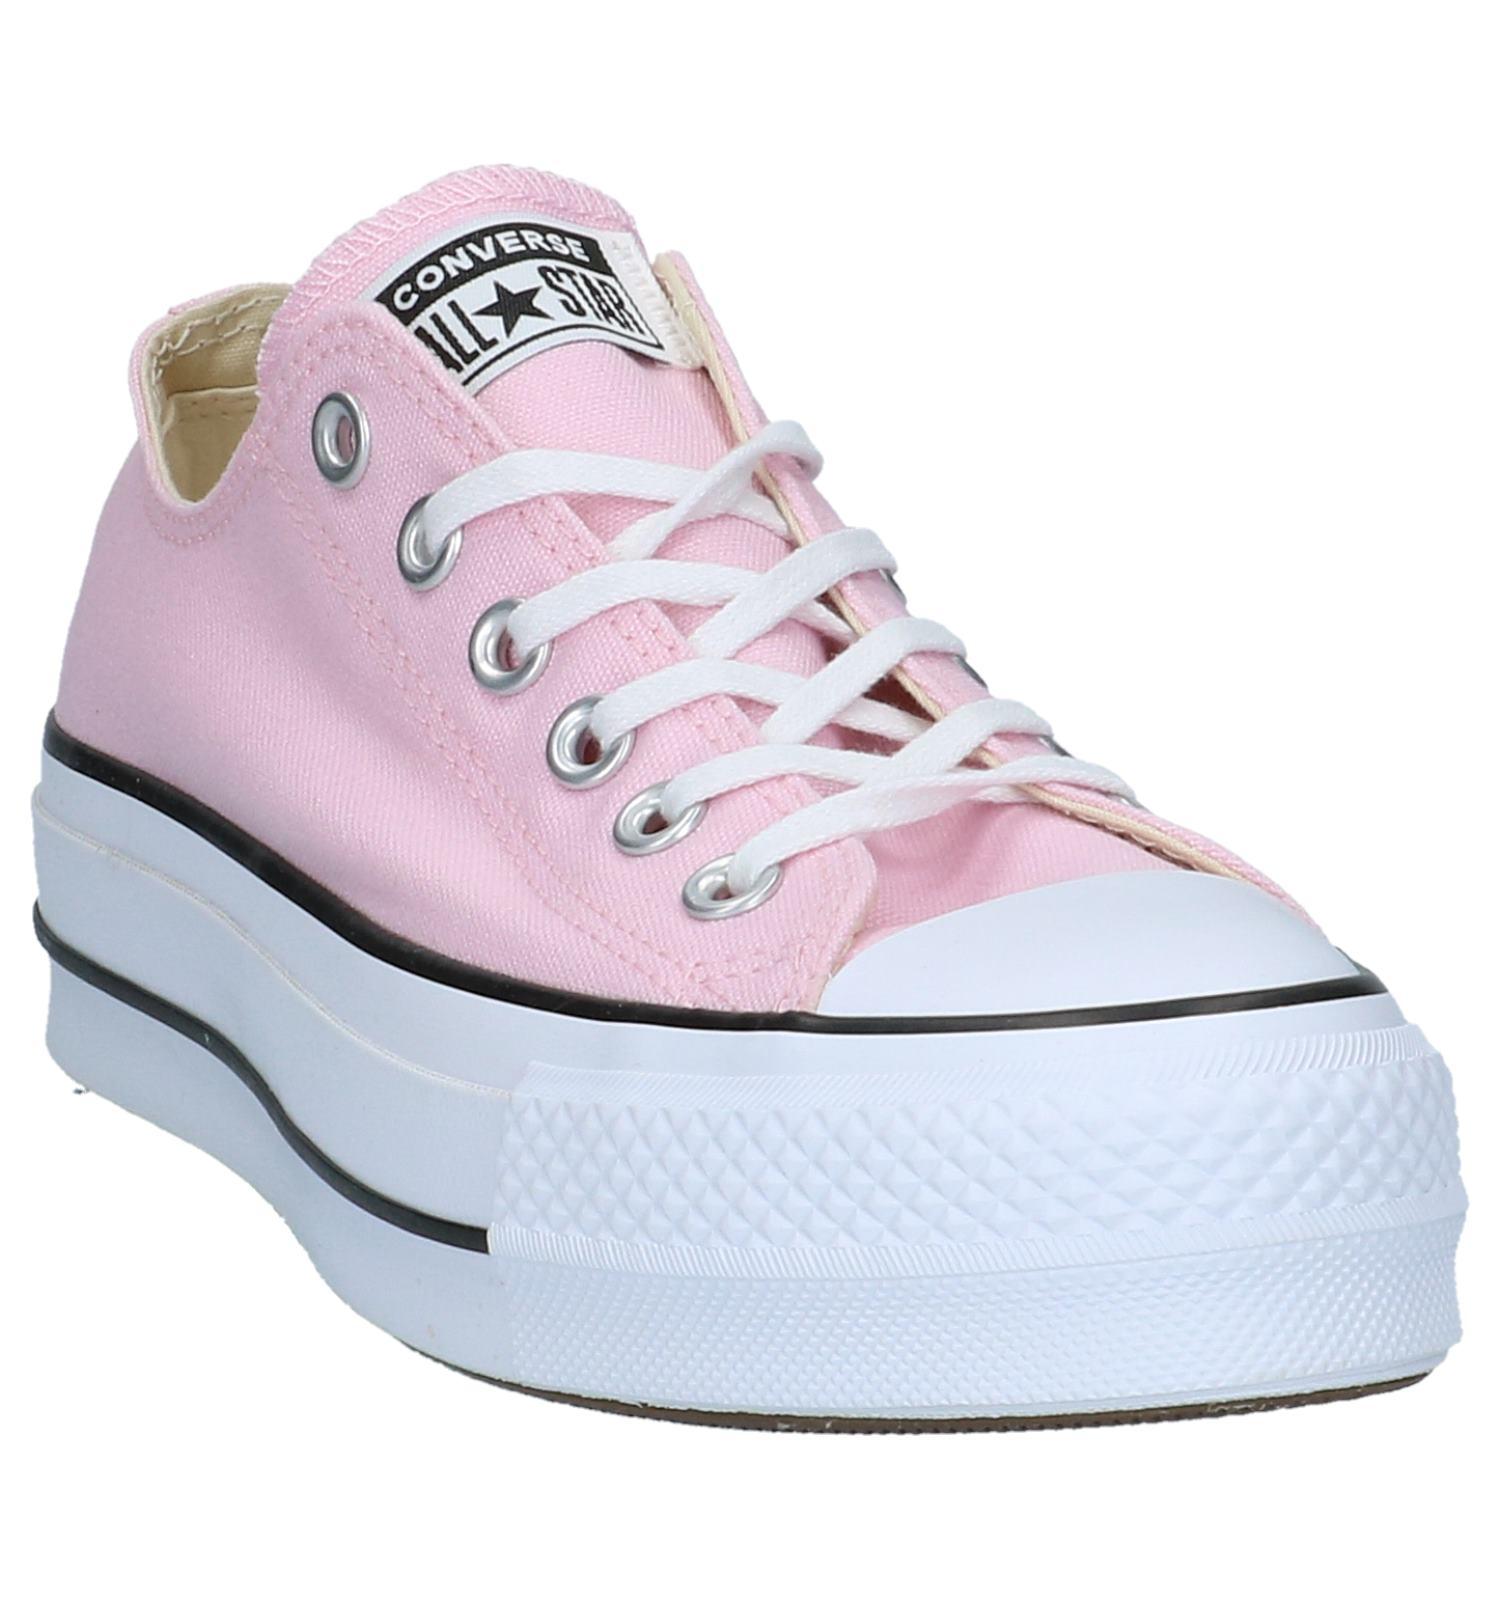 57fb002bc32 Converse Chuck Taylor All Star Lift Roze Sneakers   TORFS.BE   Gratis  verzend en retour